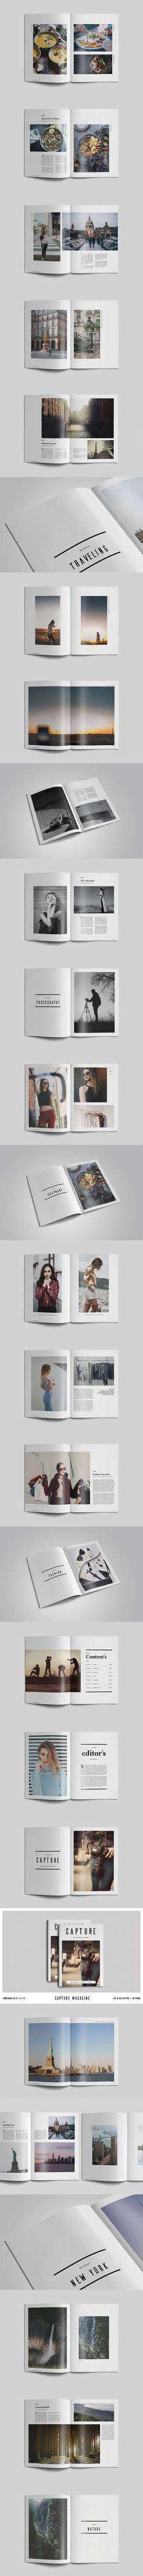 Capture Magazine / Portfolio